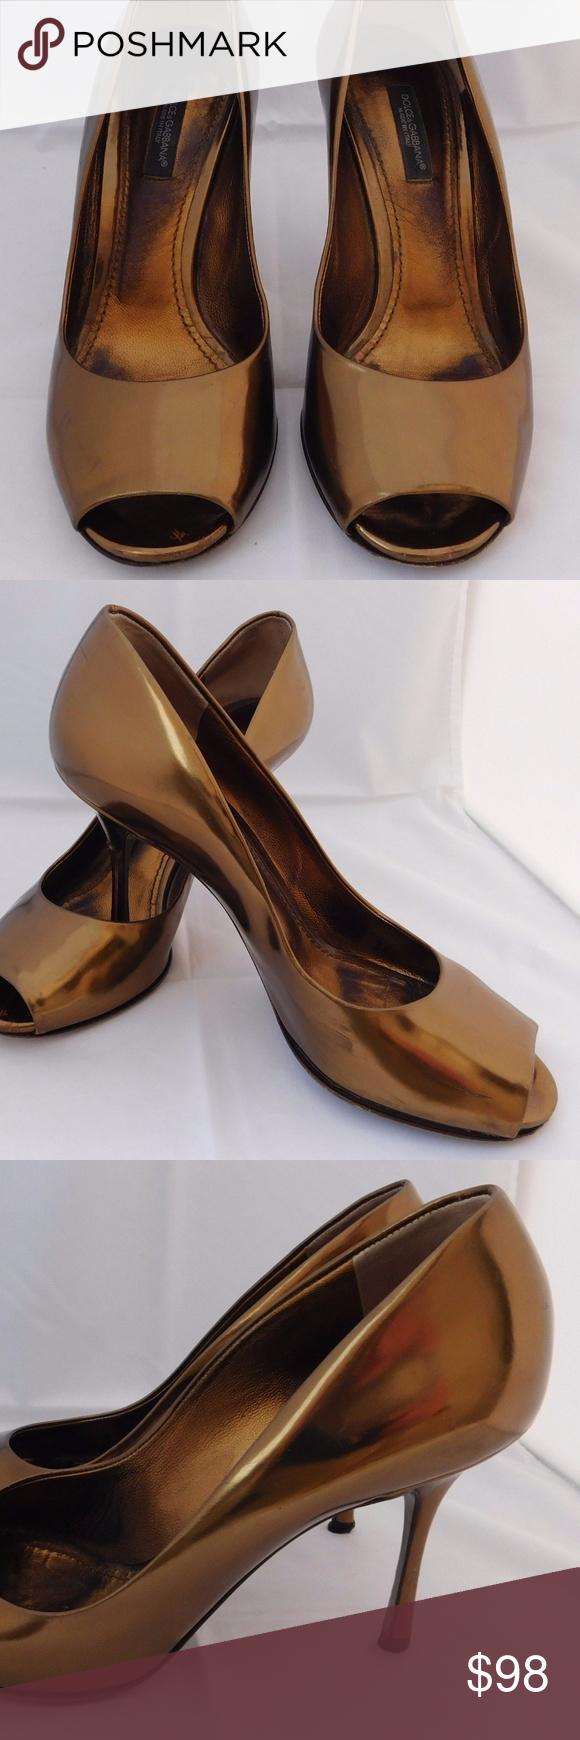 42fe81effb Dolce Gabbana Gold Metallic Pumps Heels Shoes 36.5 DOLCE & GABBANA Metallic  Bronze Patent Leather Shoes